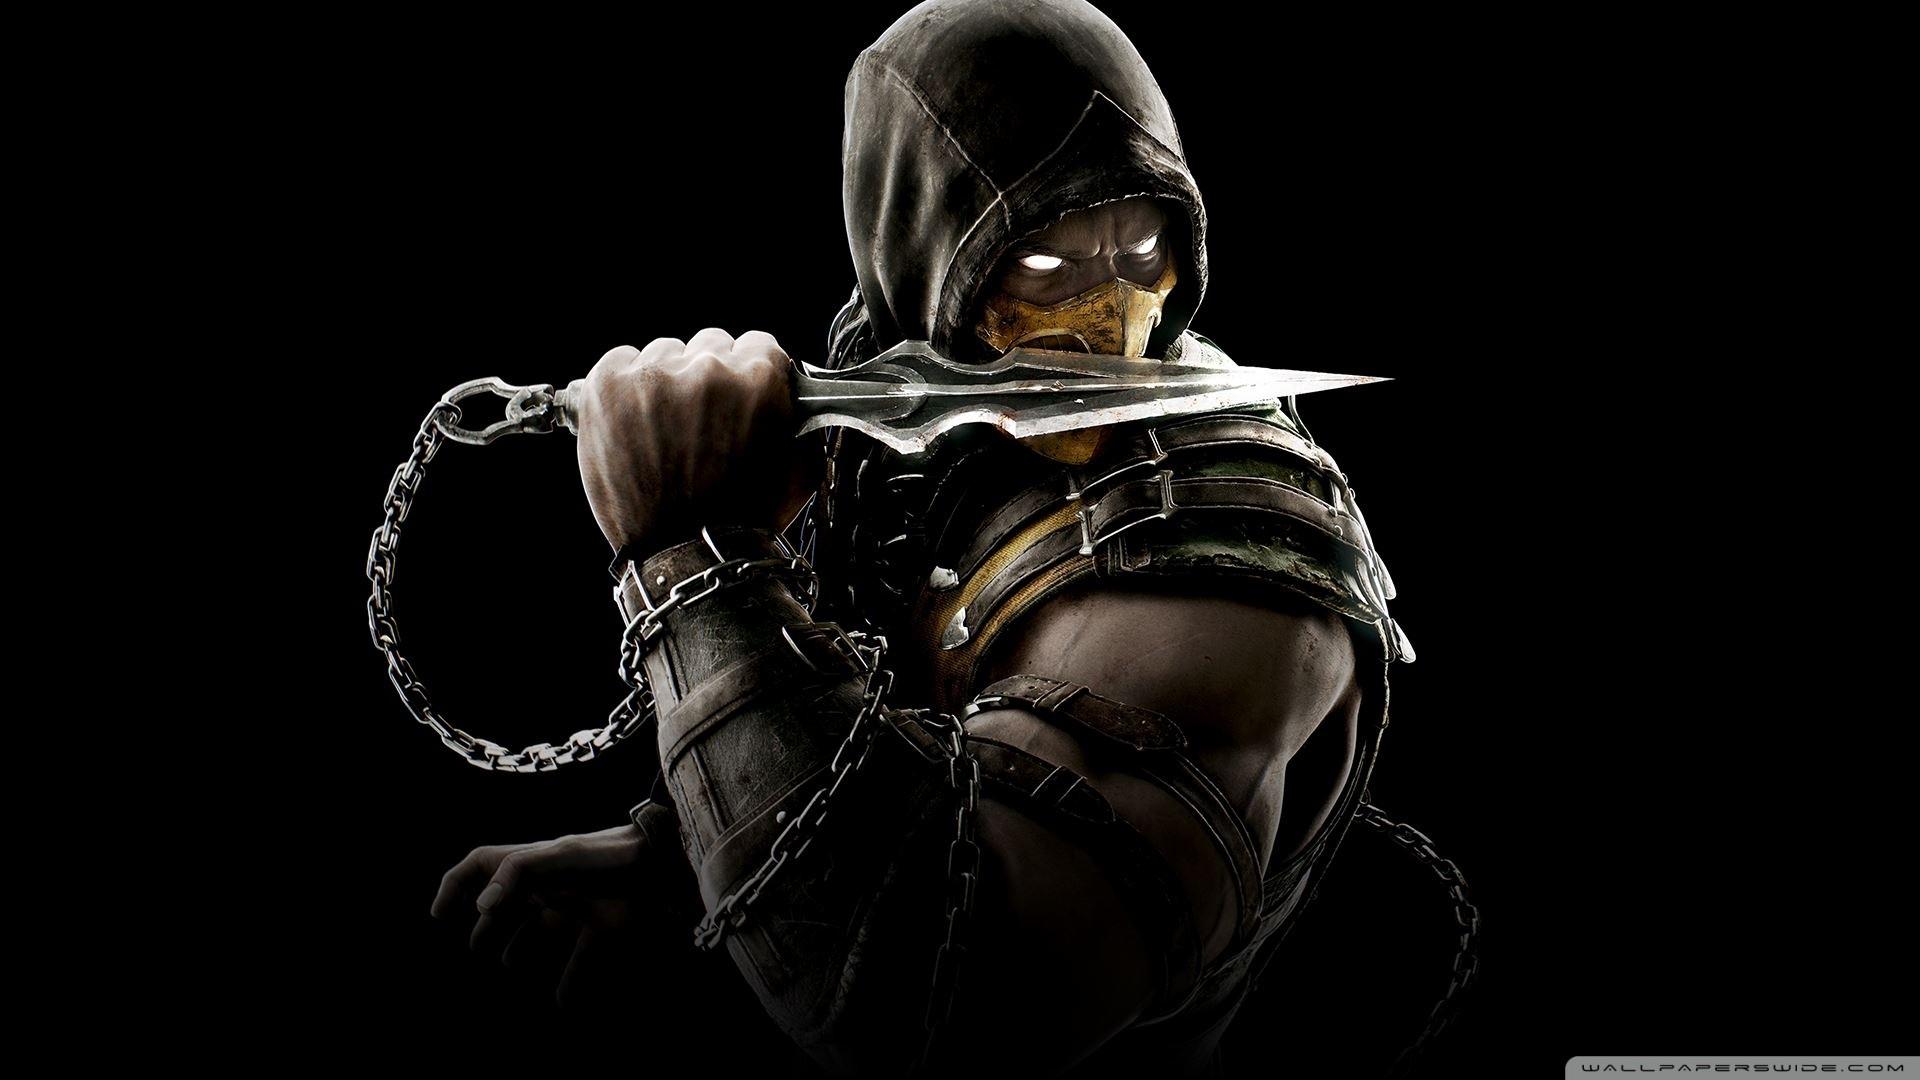 Mortal Kombat Scorpion Wallpaper 68 Images